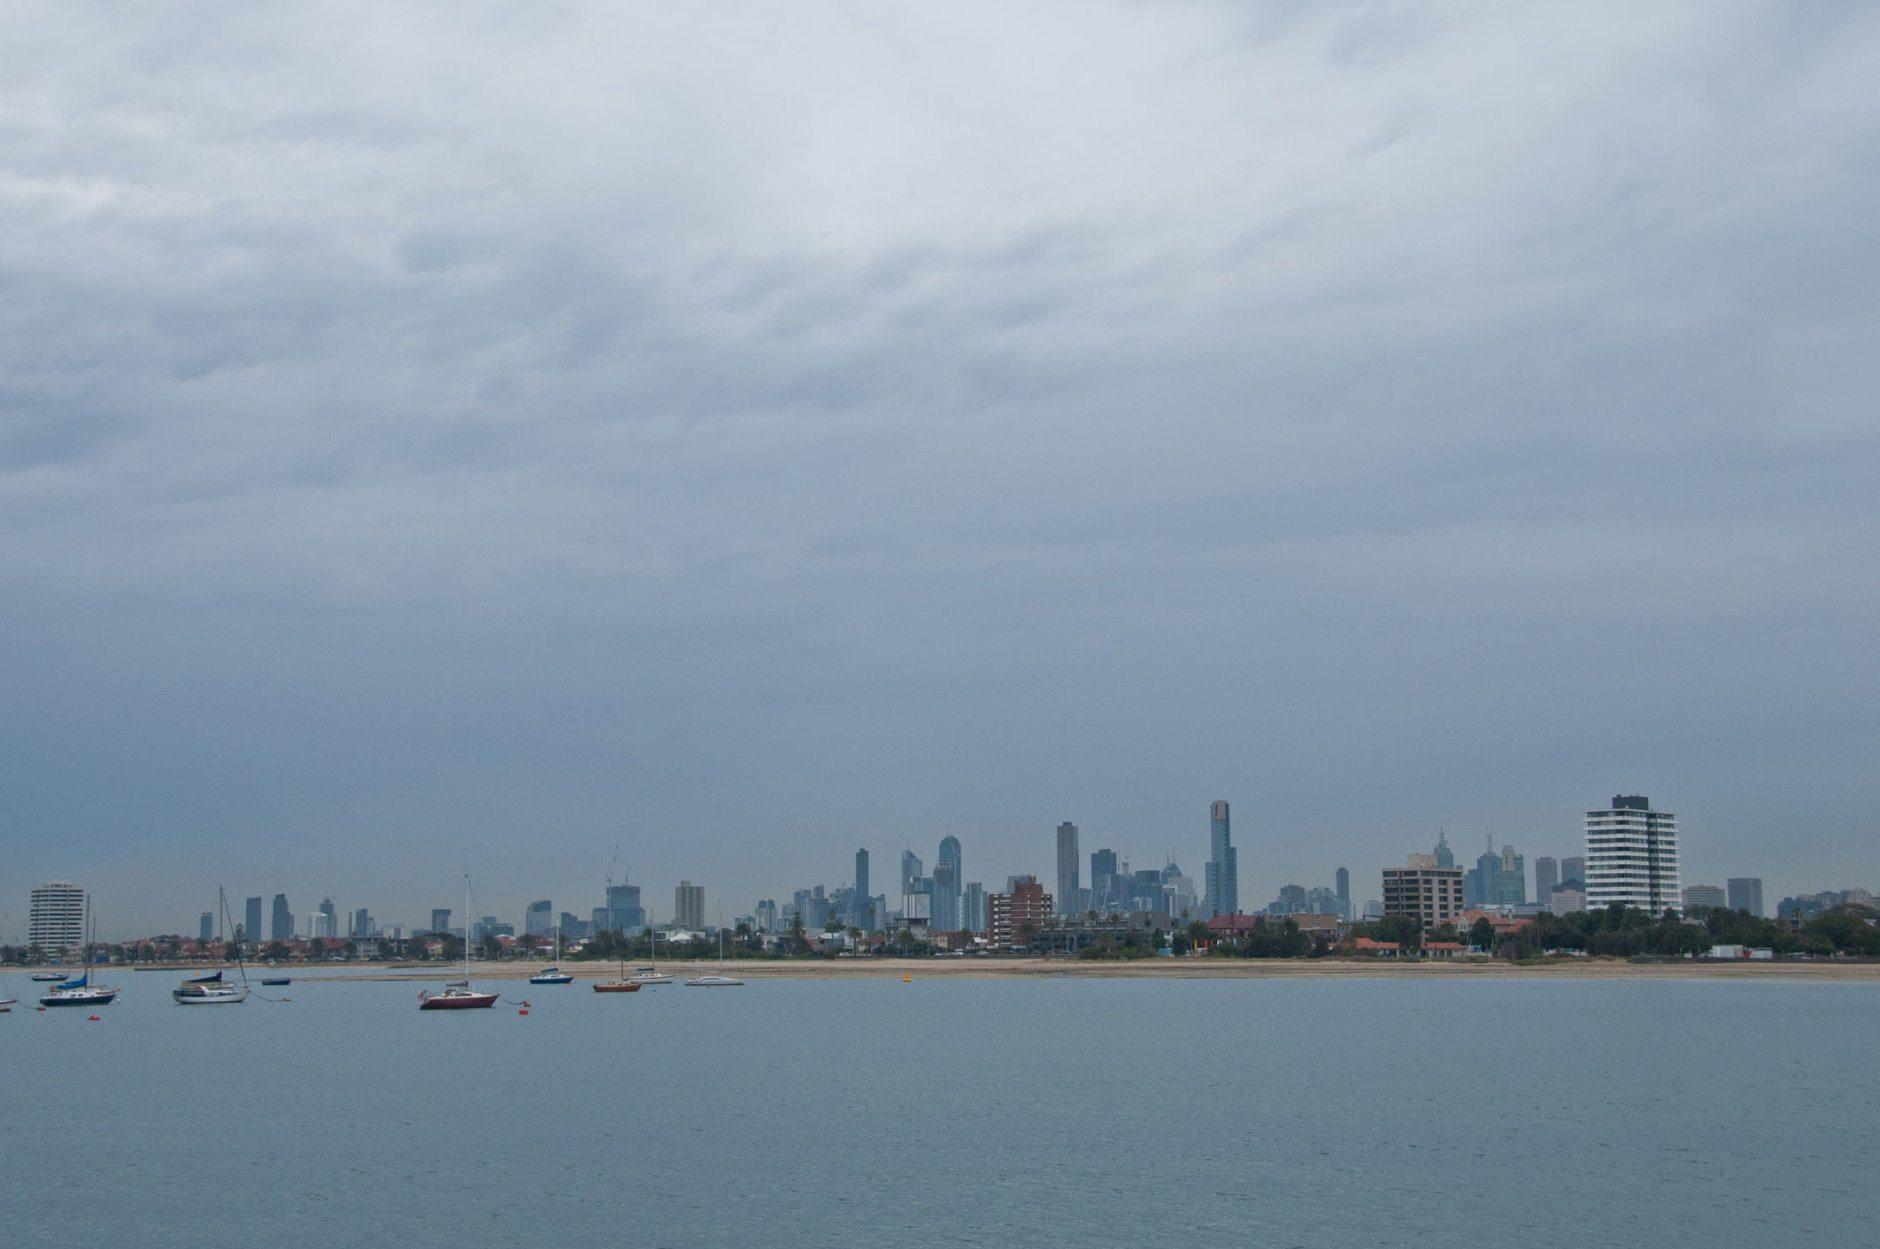 Melbourne skyline landscape scene in the evening